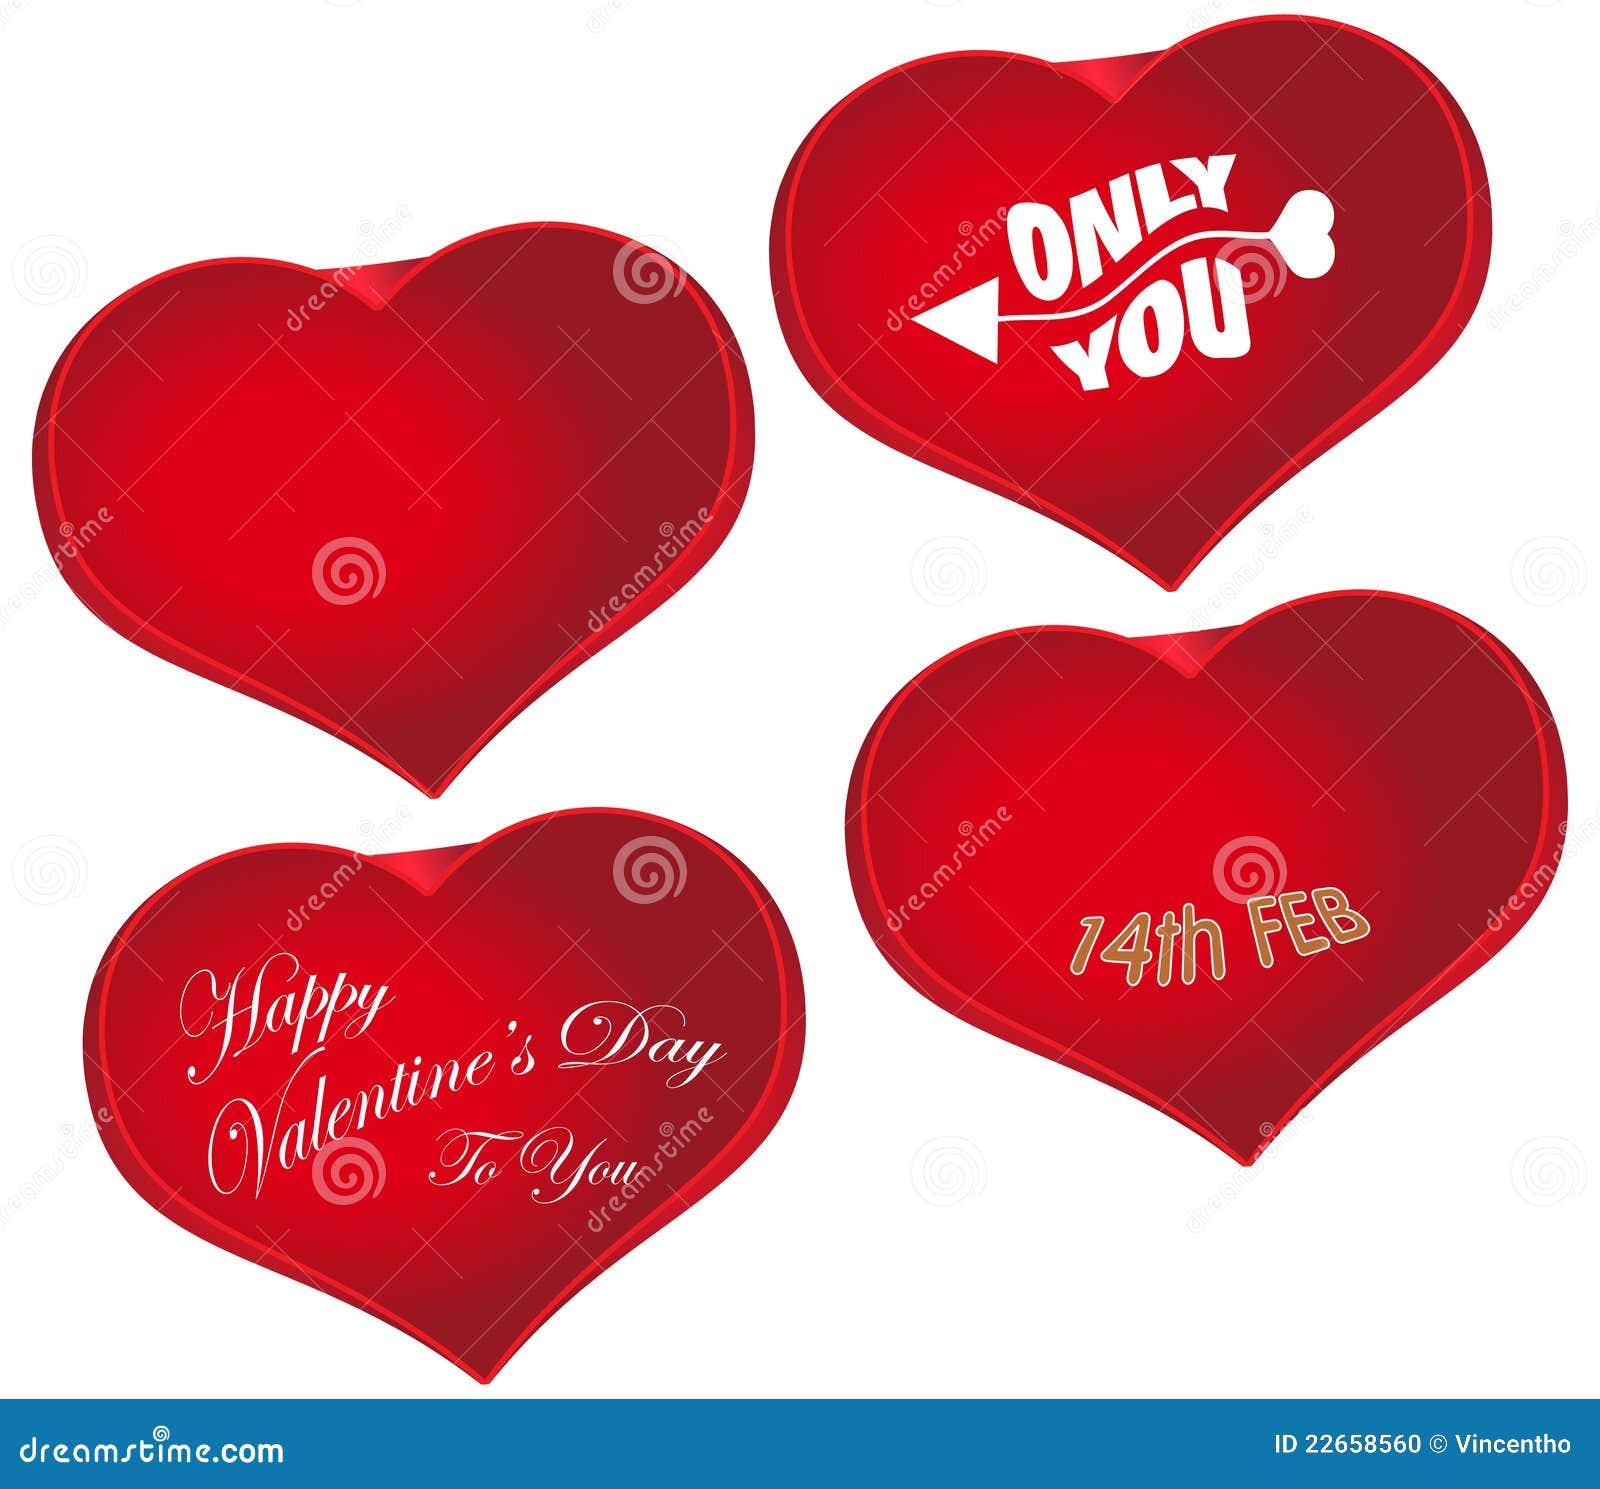 Valentines day red heart shape love symbol stock vector image valentine s day red heart shape love symbol biocorpaavc